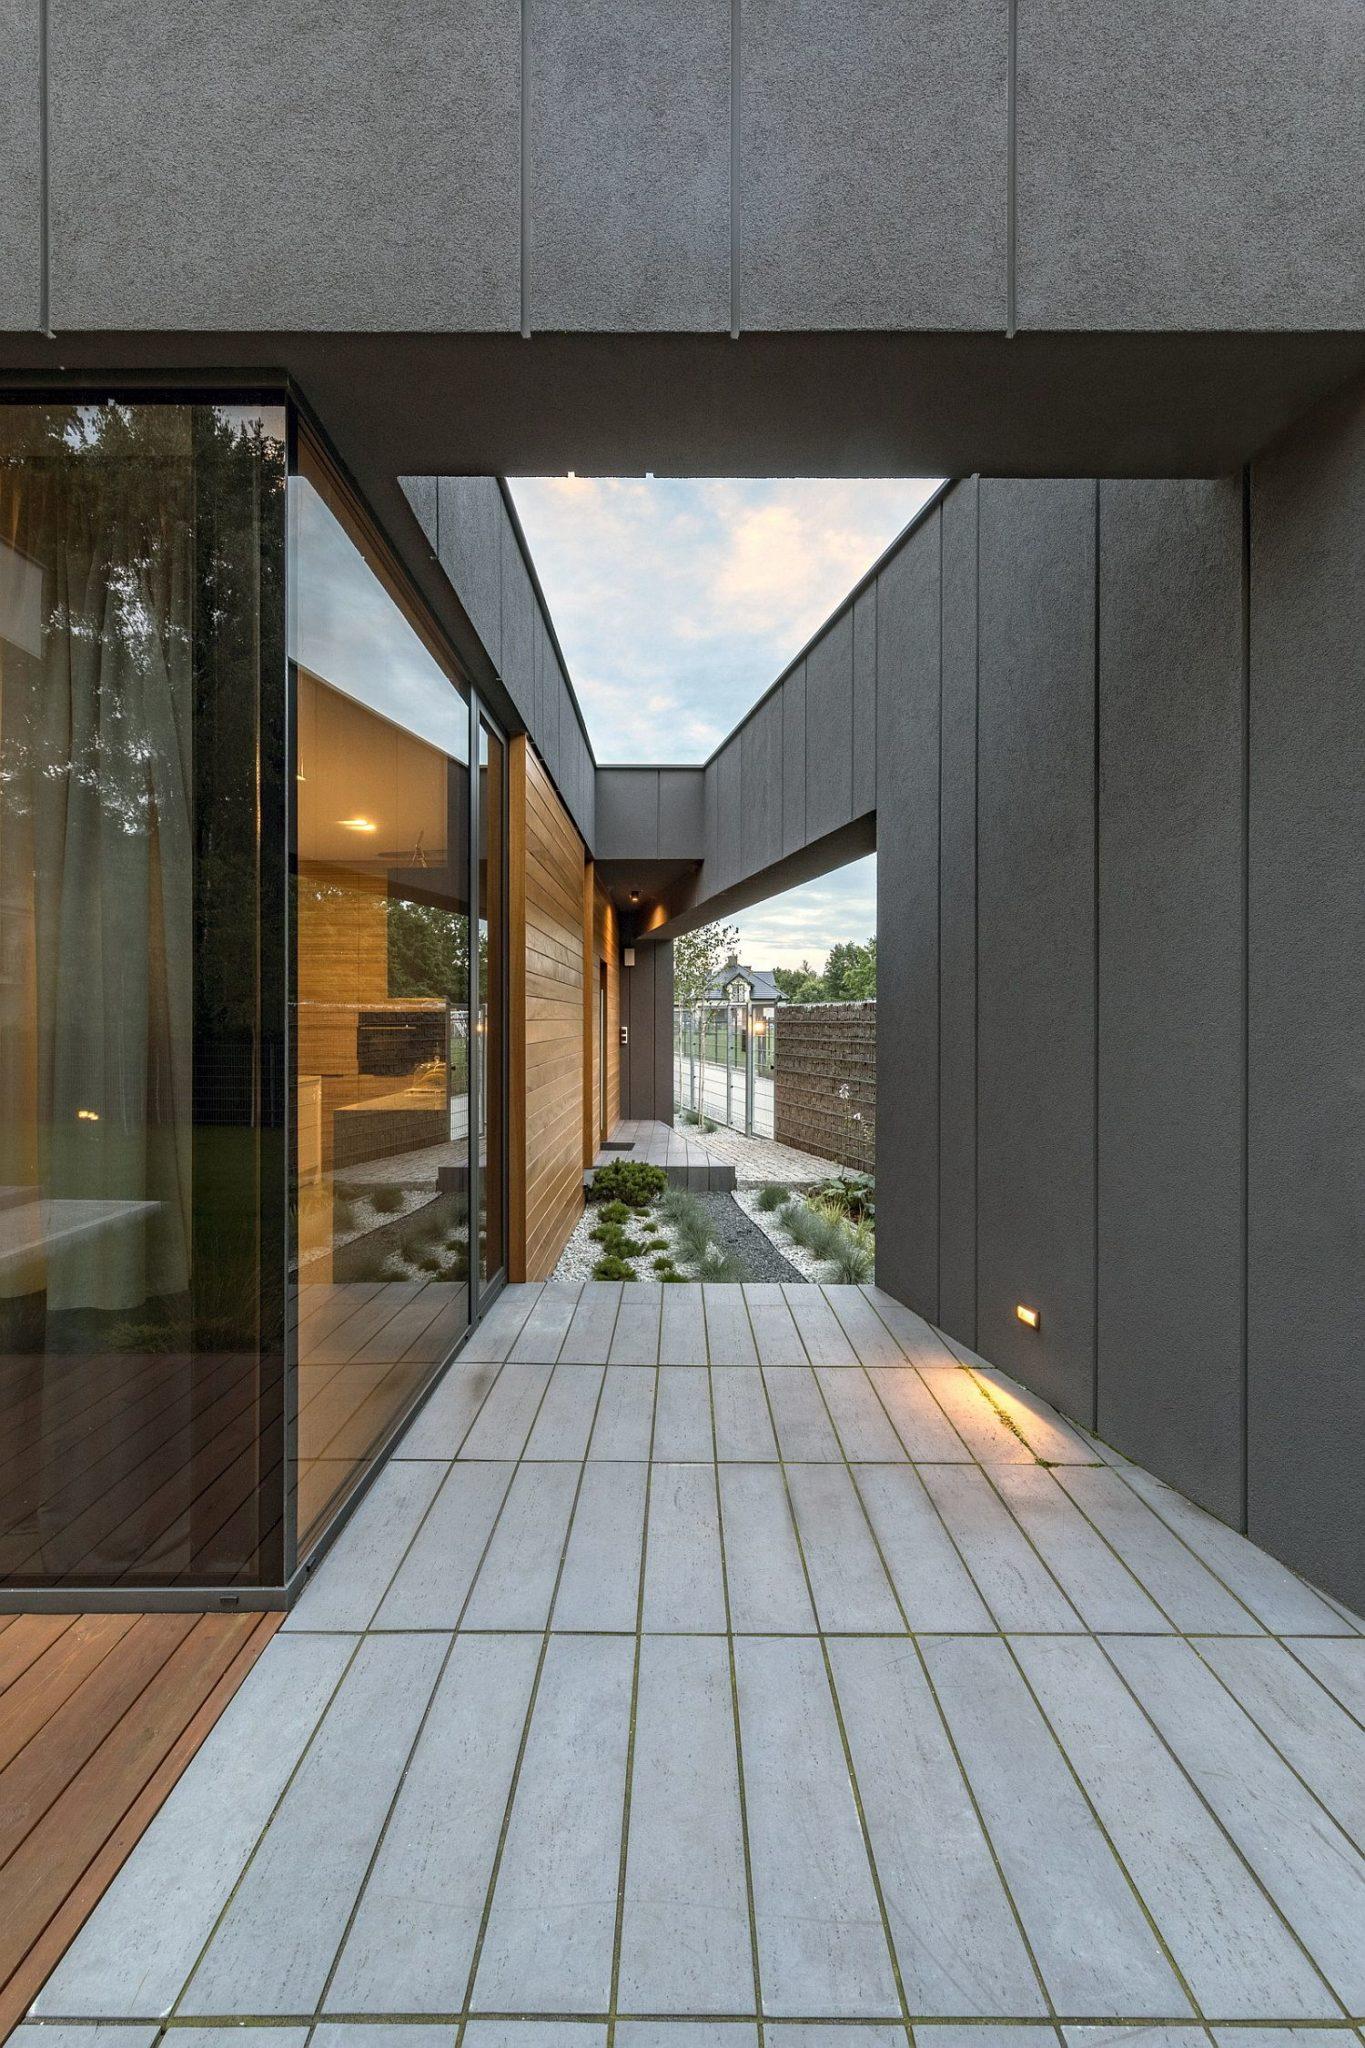 Beautifully illuminated entryway of the FIL House